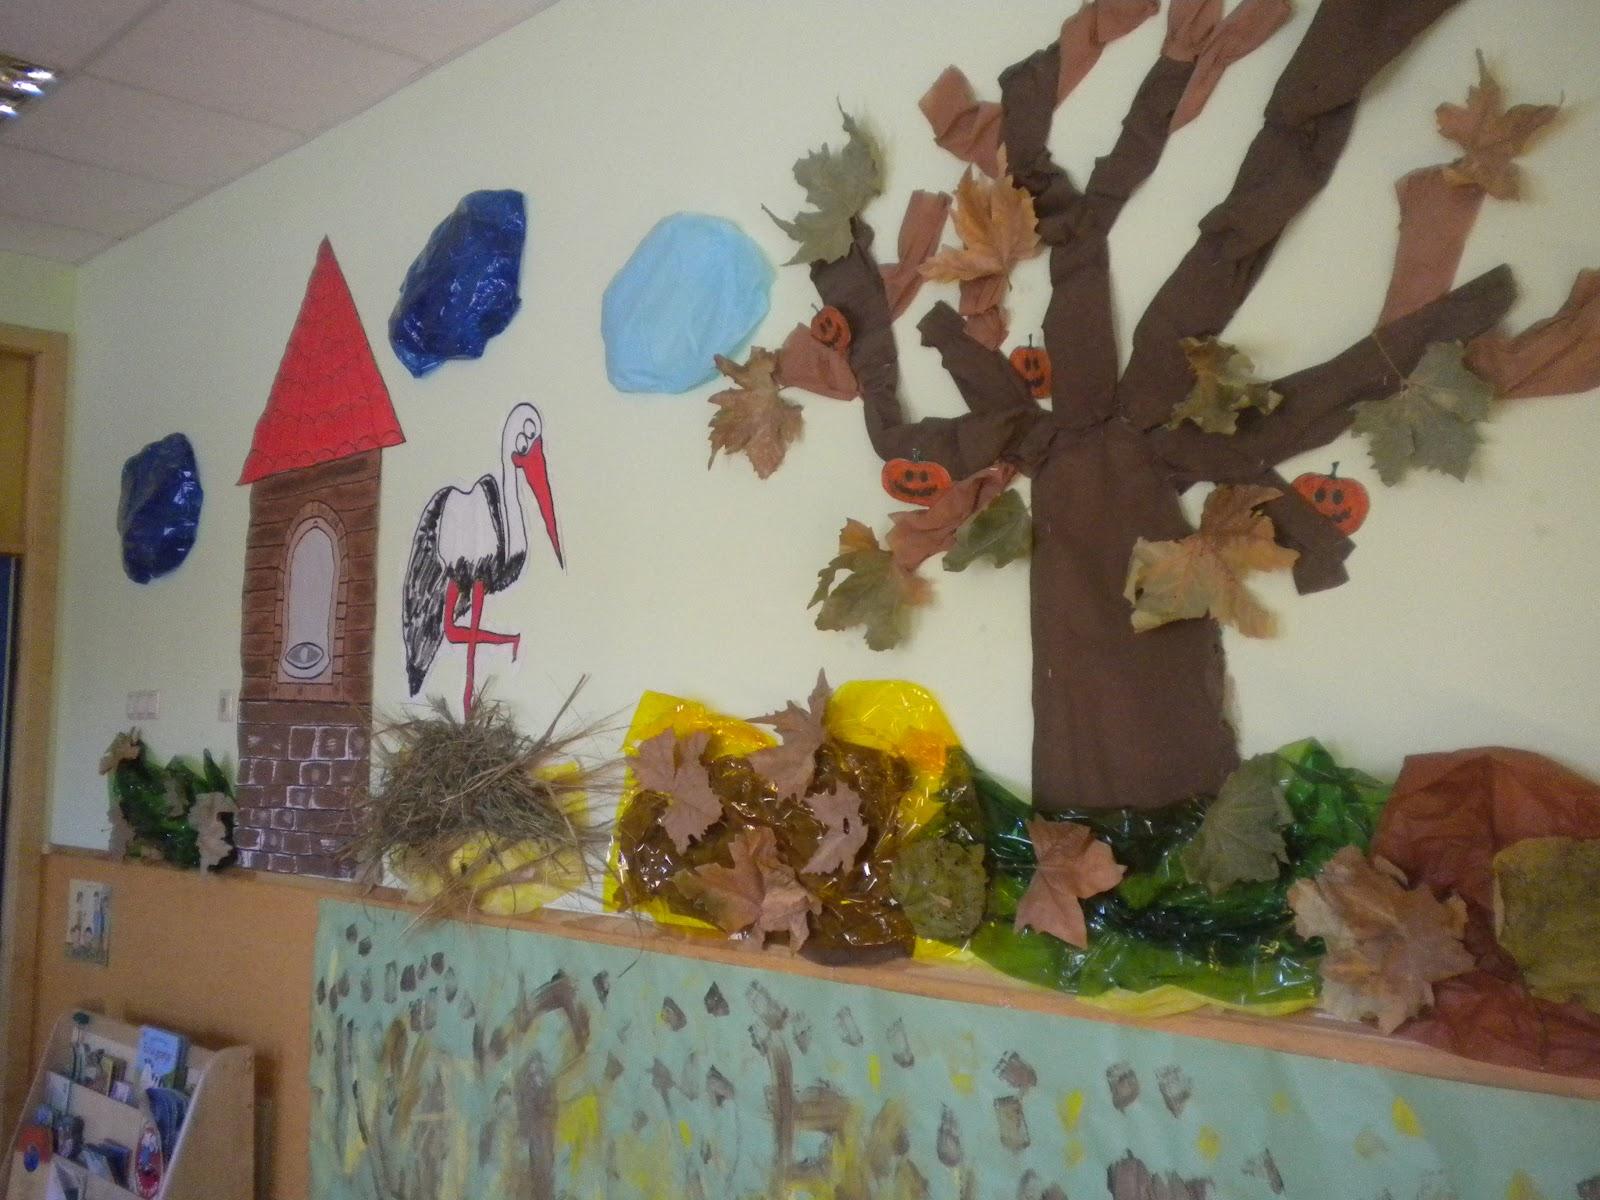 Recursos de educaci n infantil decoraci n del aula for Decoracion de aula para navidad